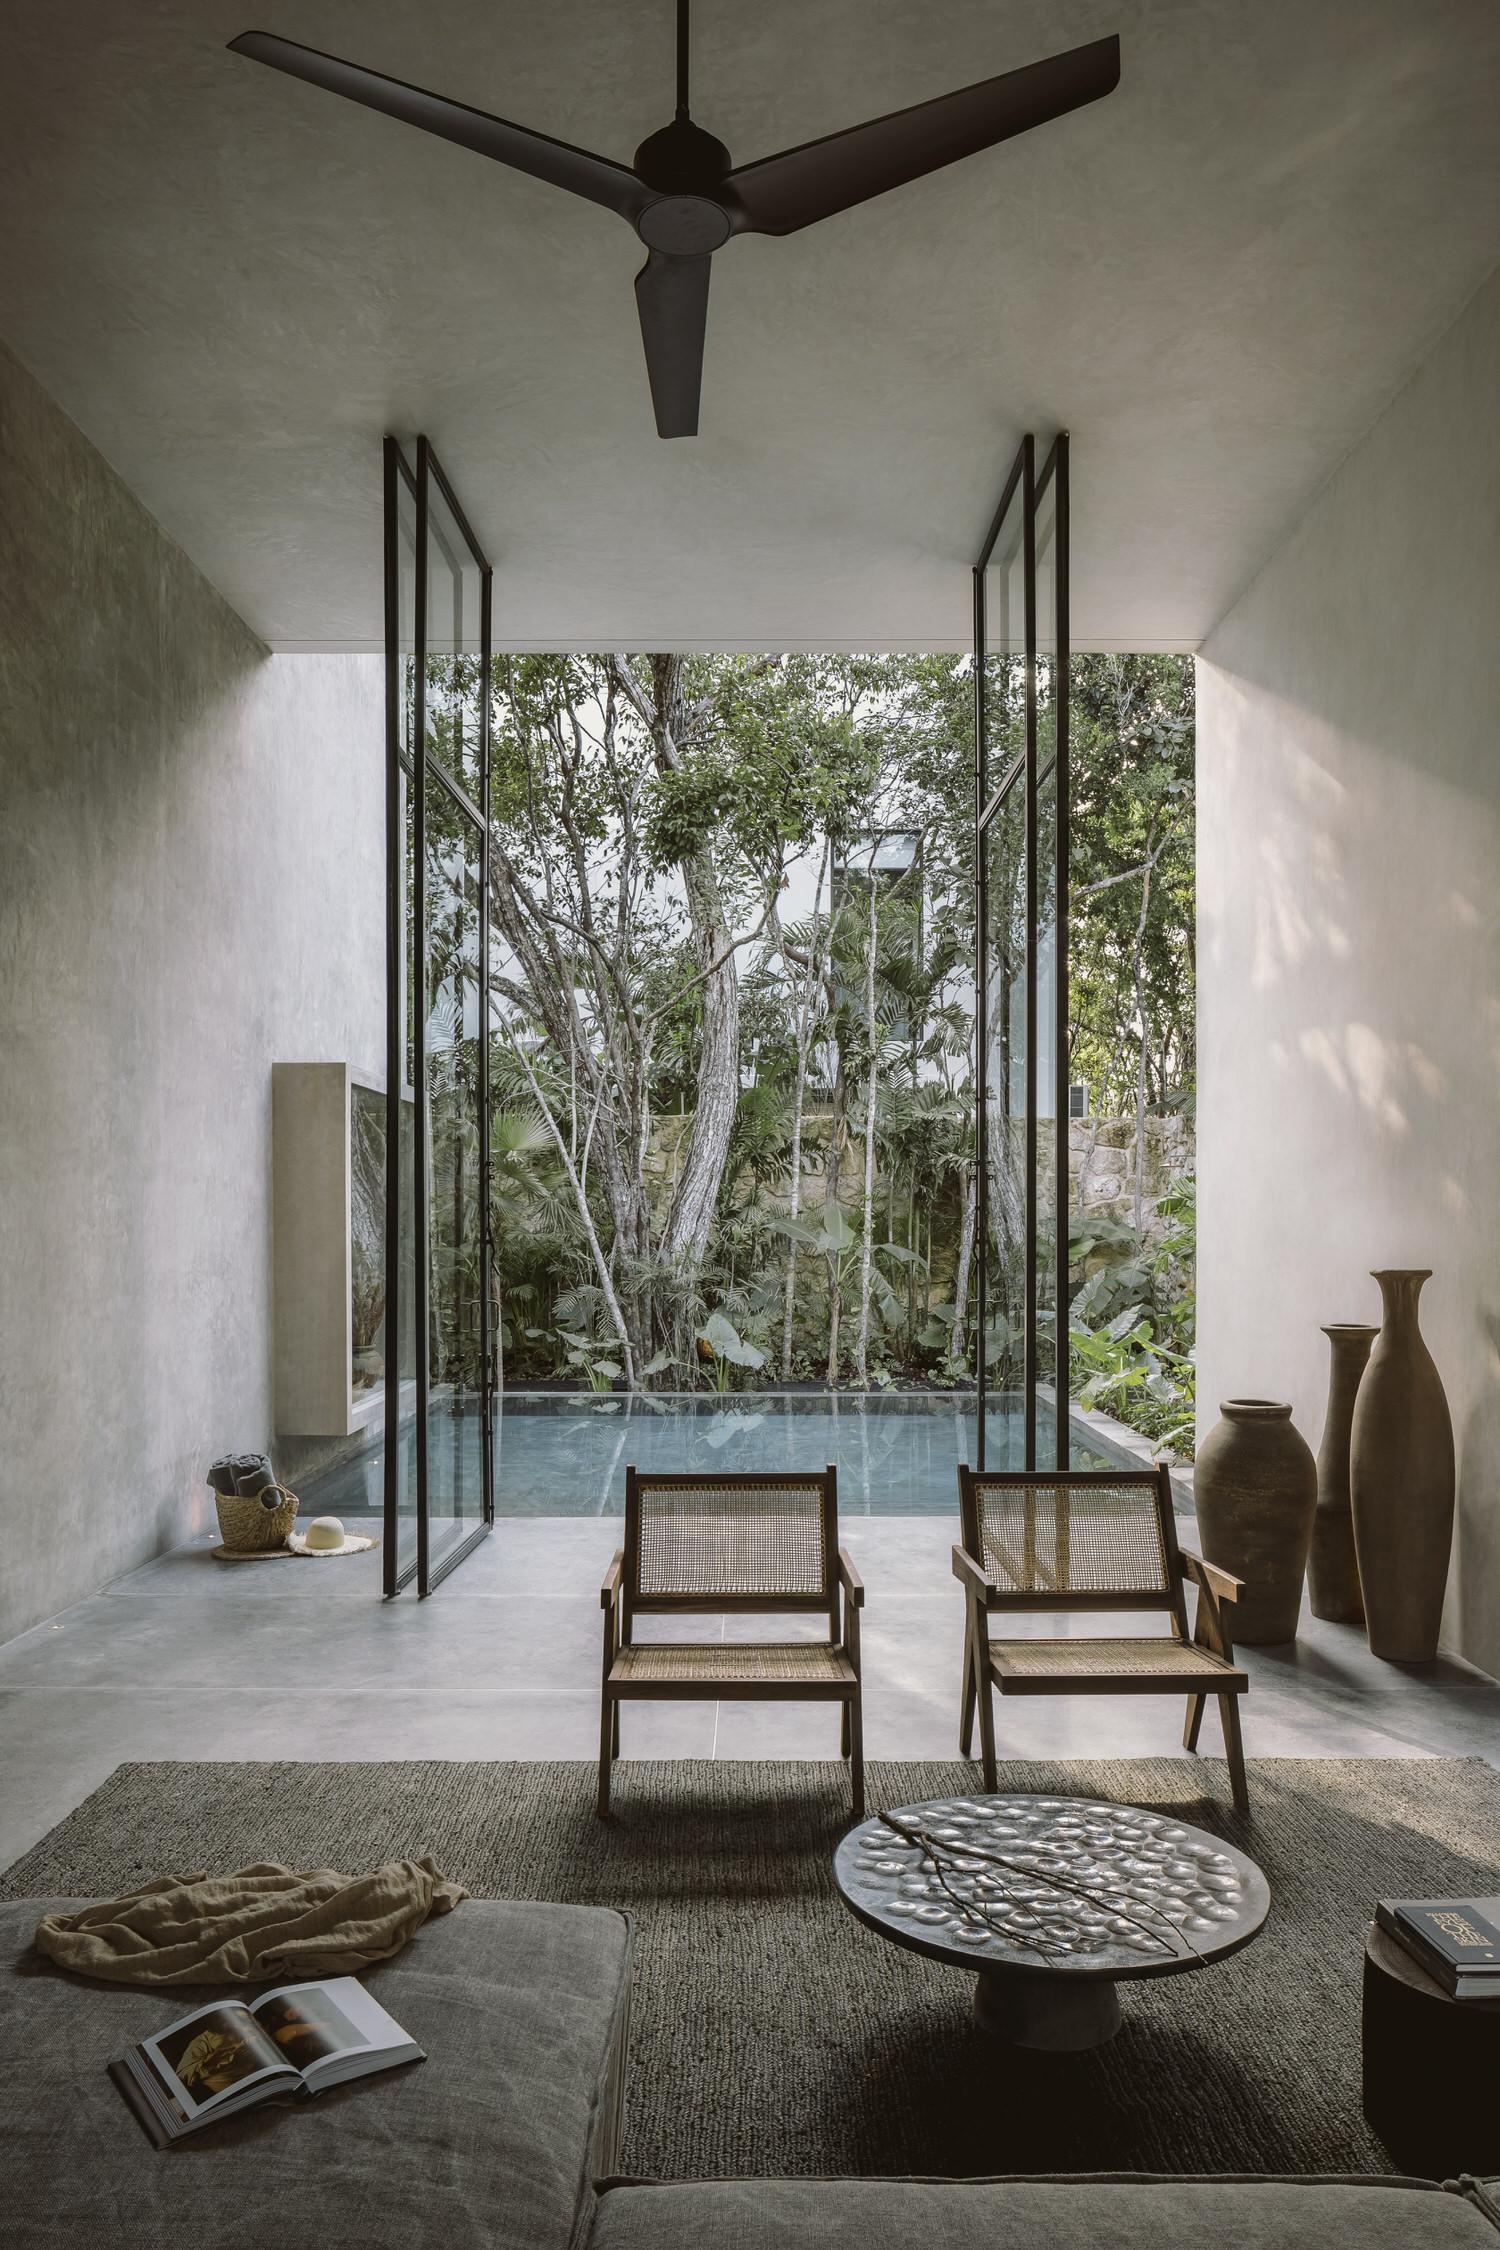 Co Lab Design Office Aviv House Tulum Mexico Arxhitecture Photo Cesar Bejar Yellowtrace 06